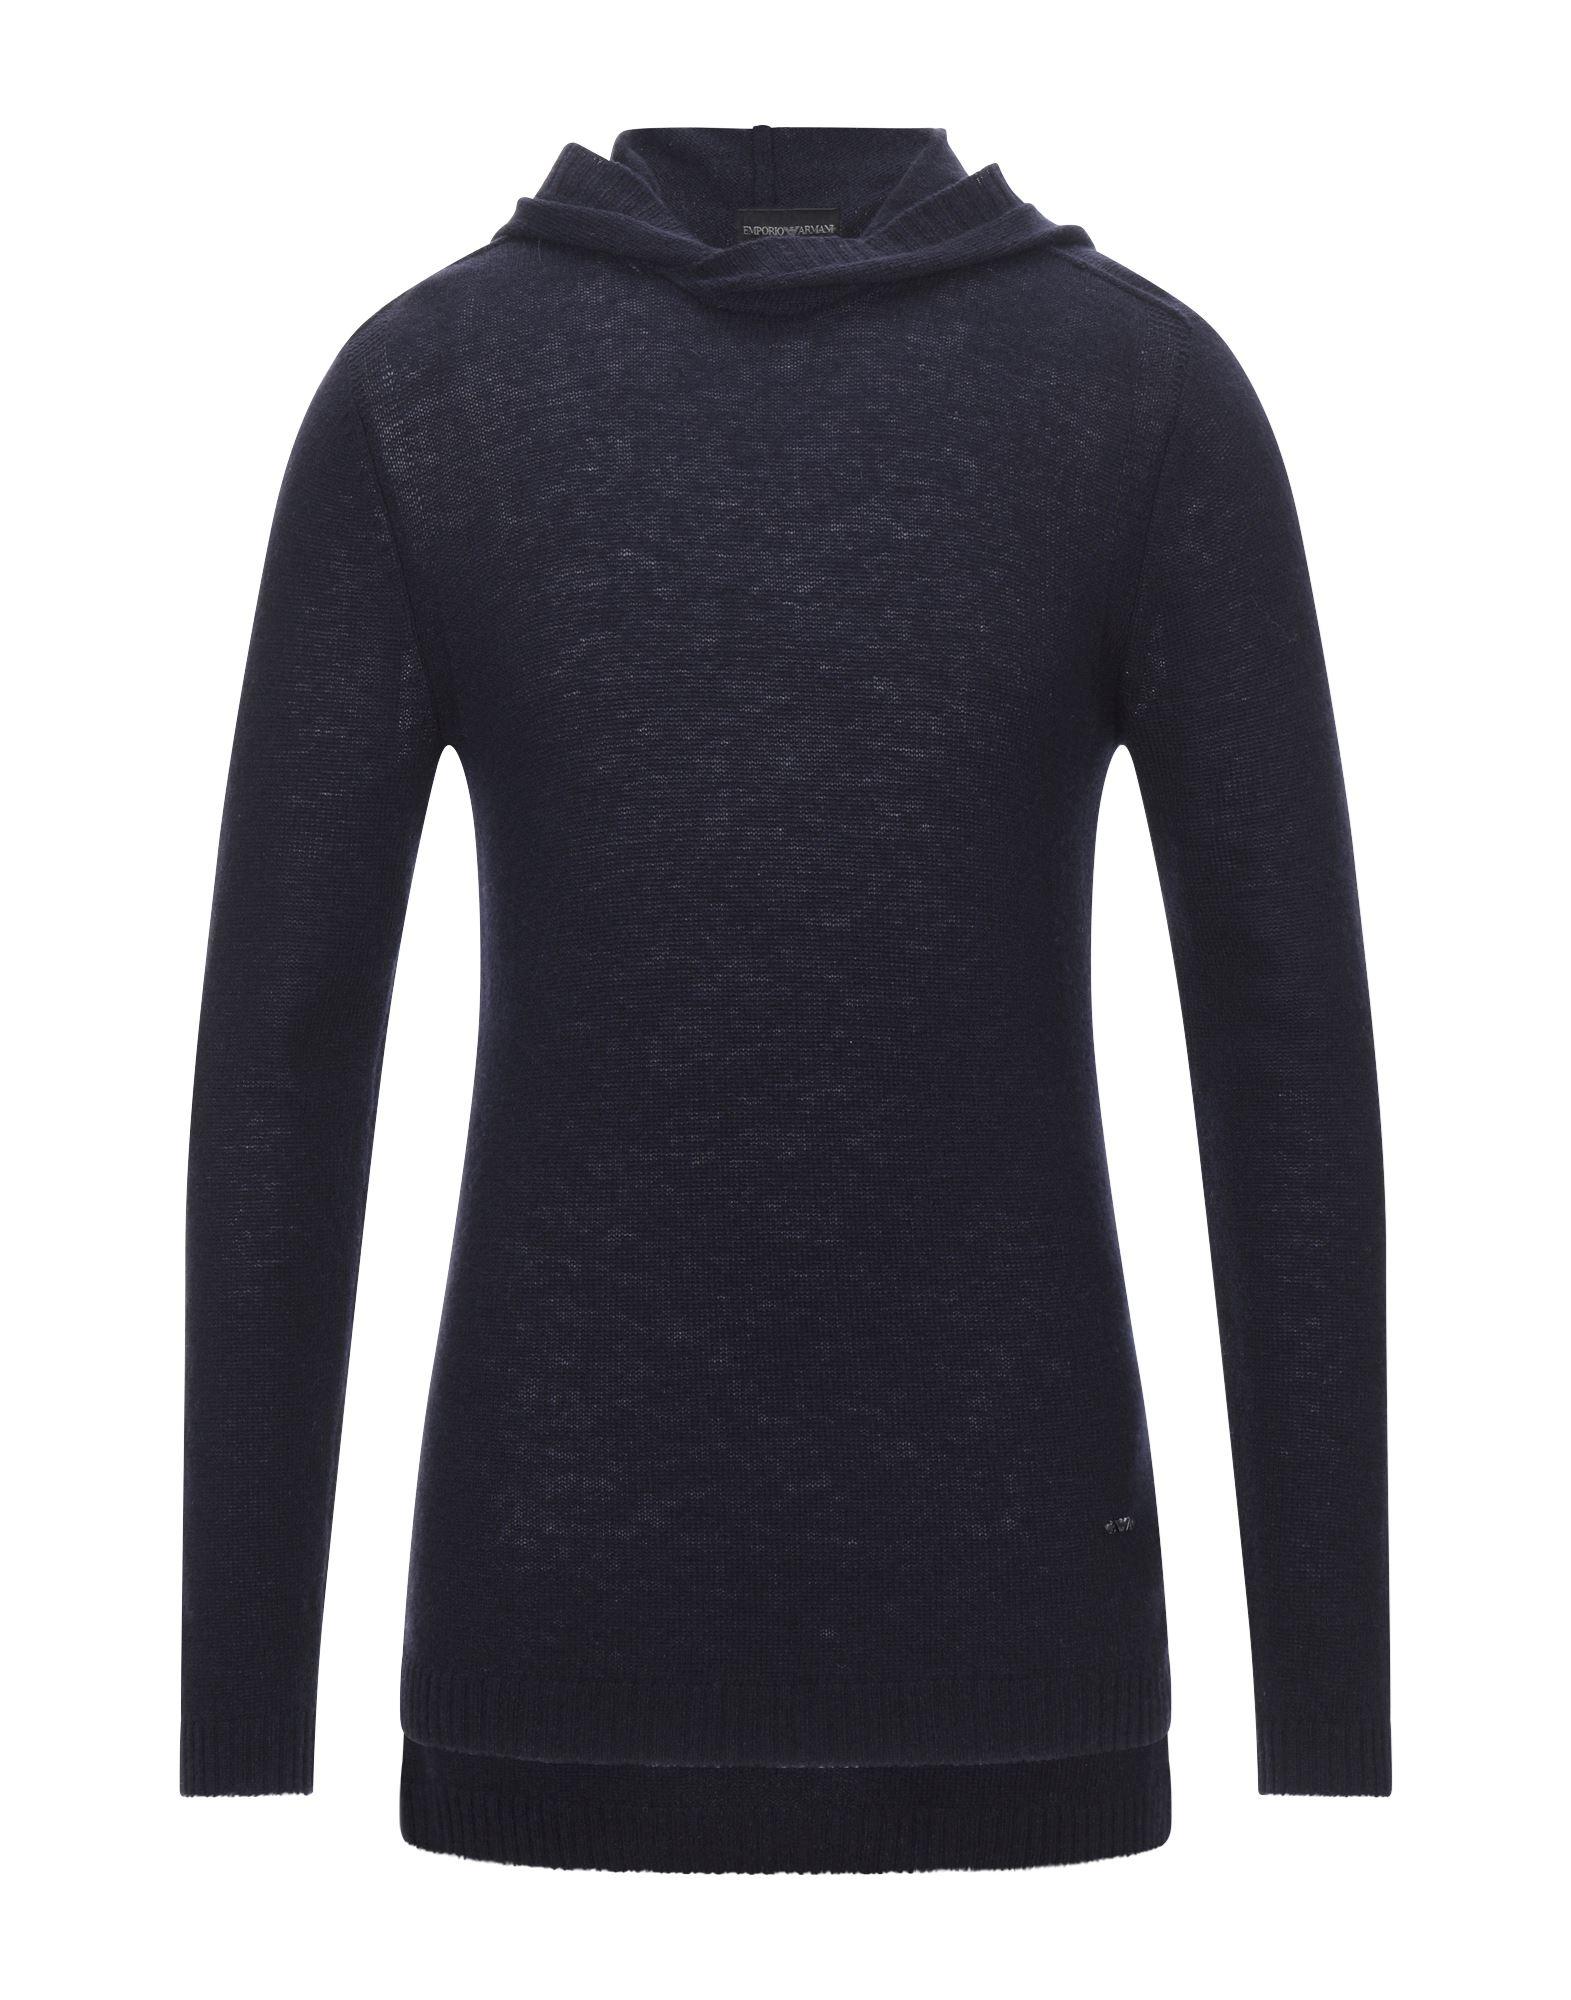 EMPORIO ARMANI Sweaters - Item 39997026